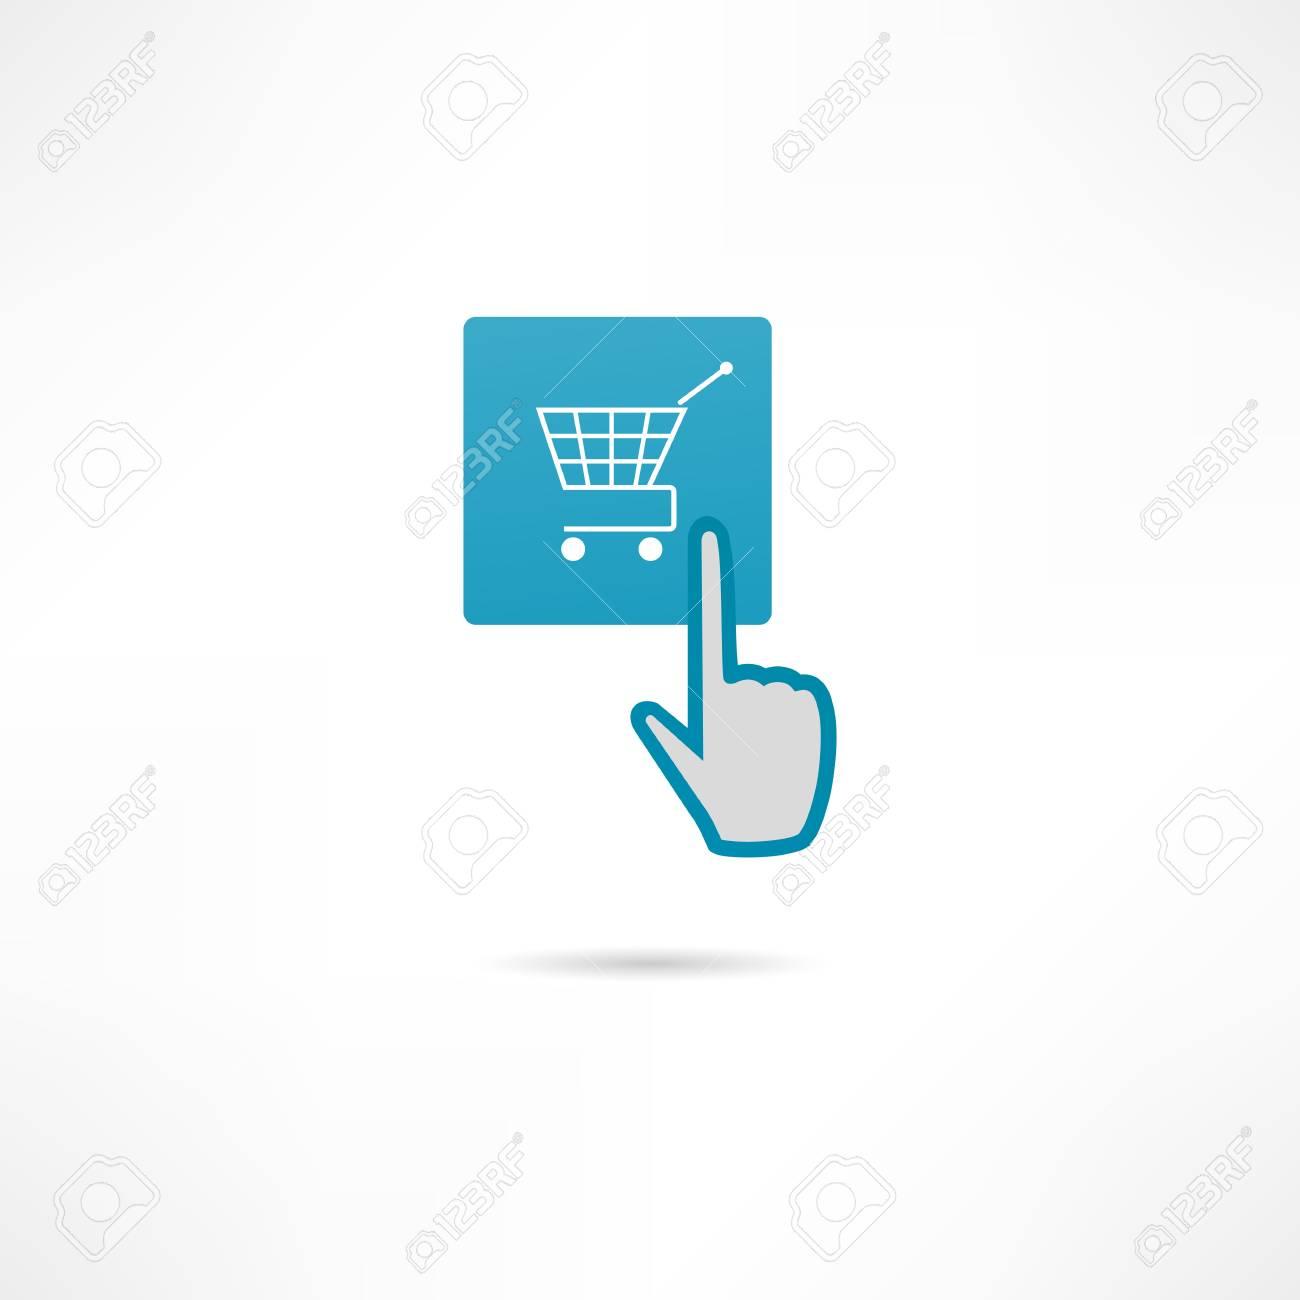 purchase icon Stock Vector - 17954850